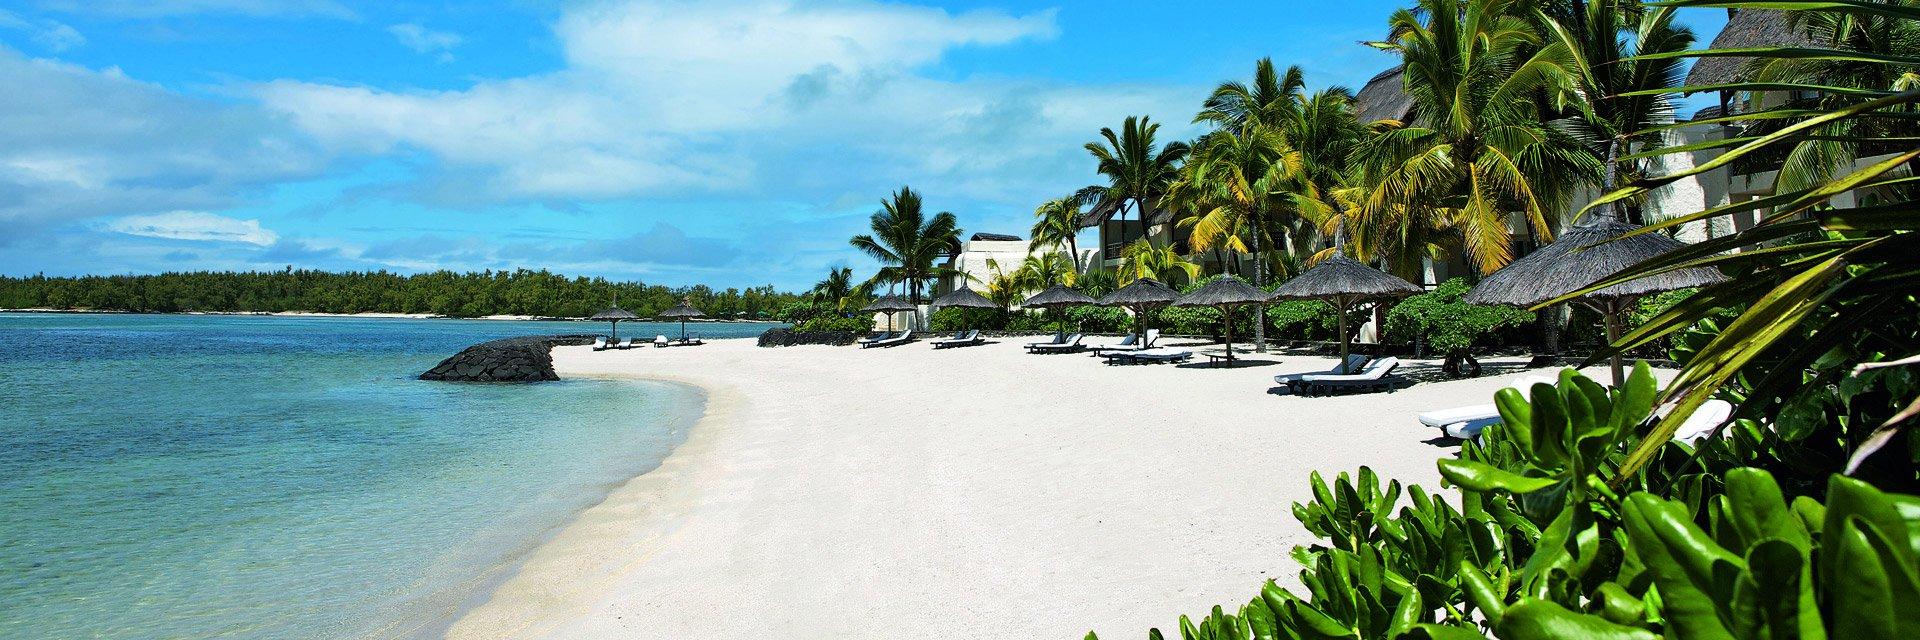 Гран Гоб, Маврикий. Карта курорта Гран Гоб